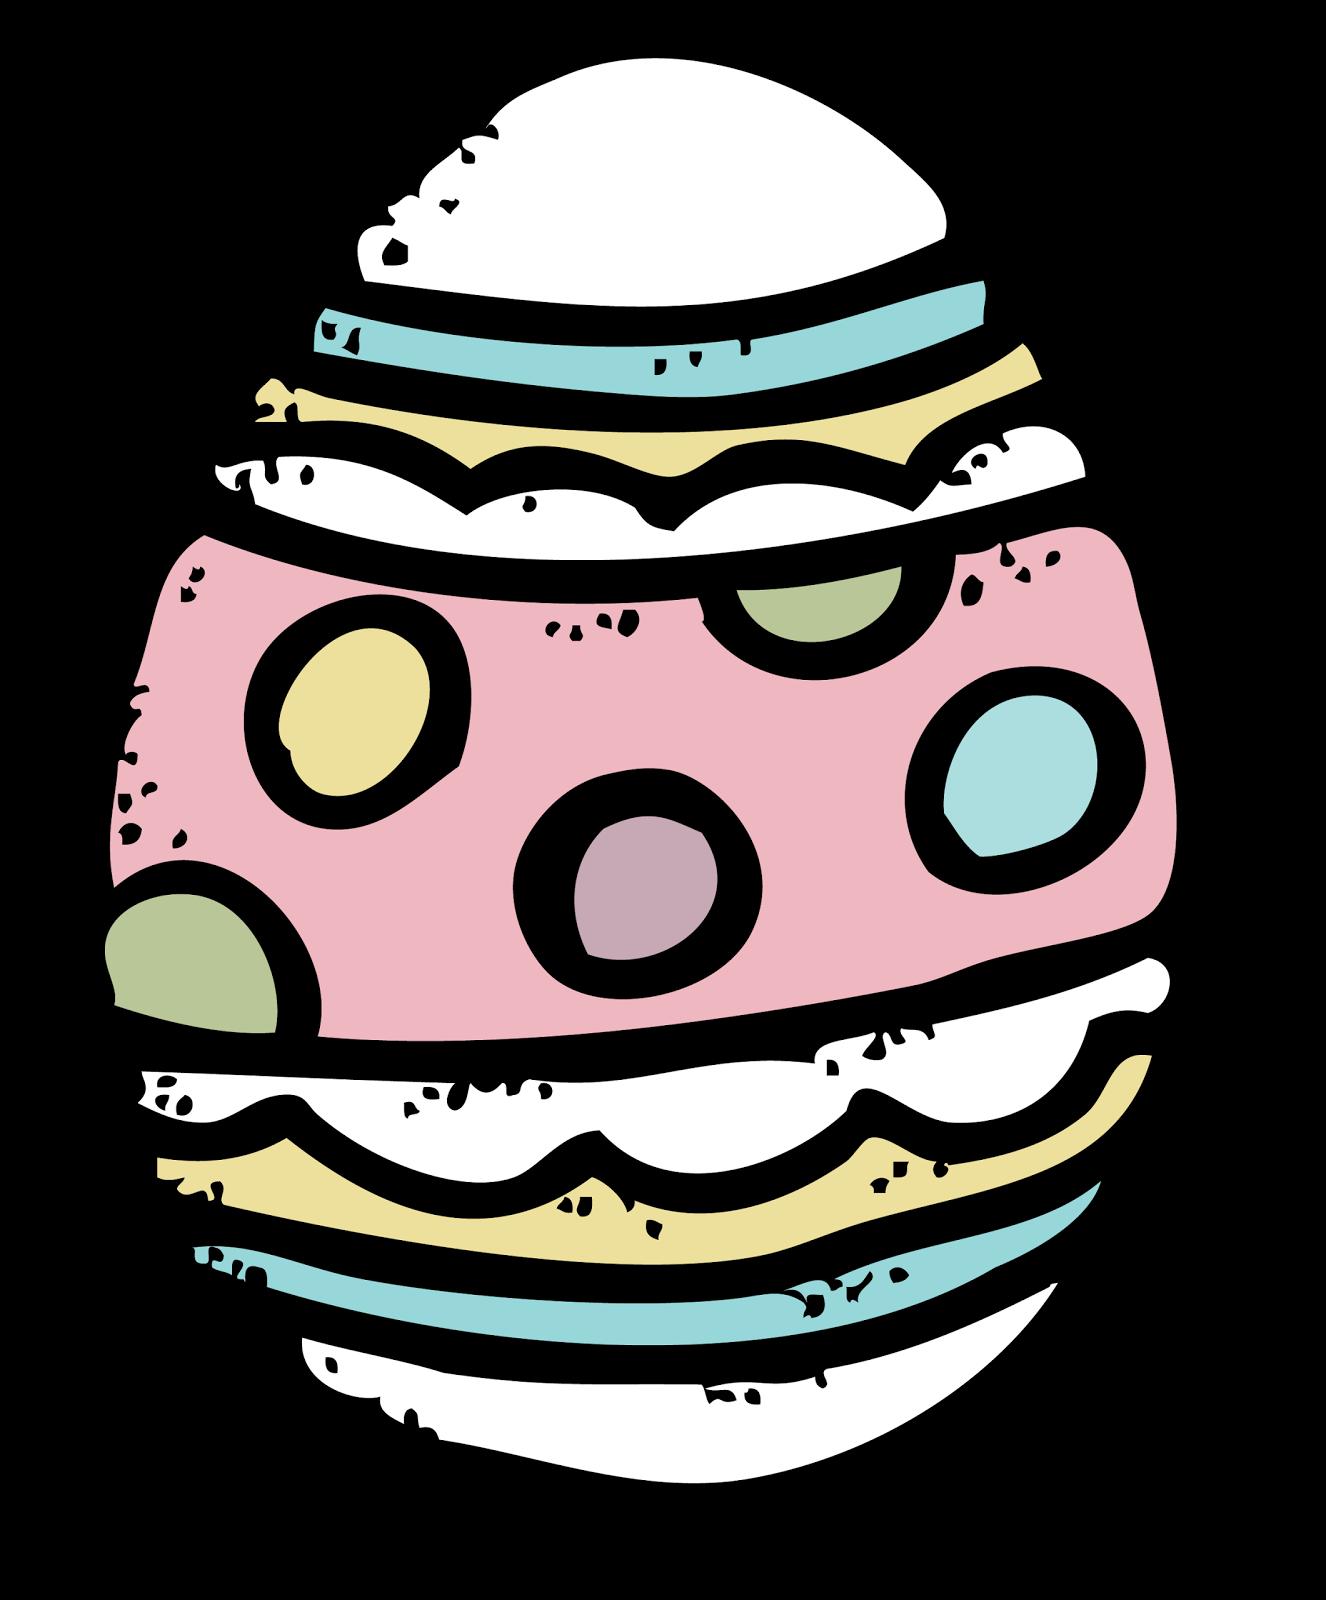 MelonHeadz: Easter Egg!